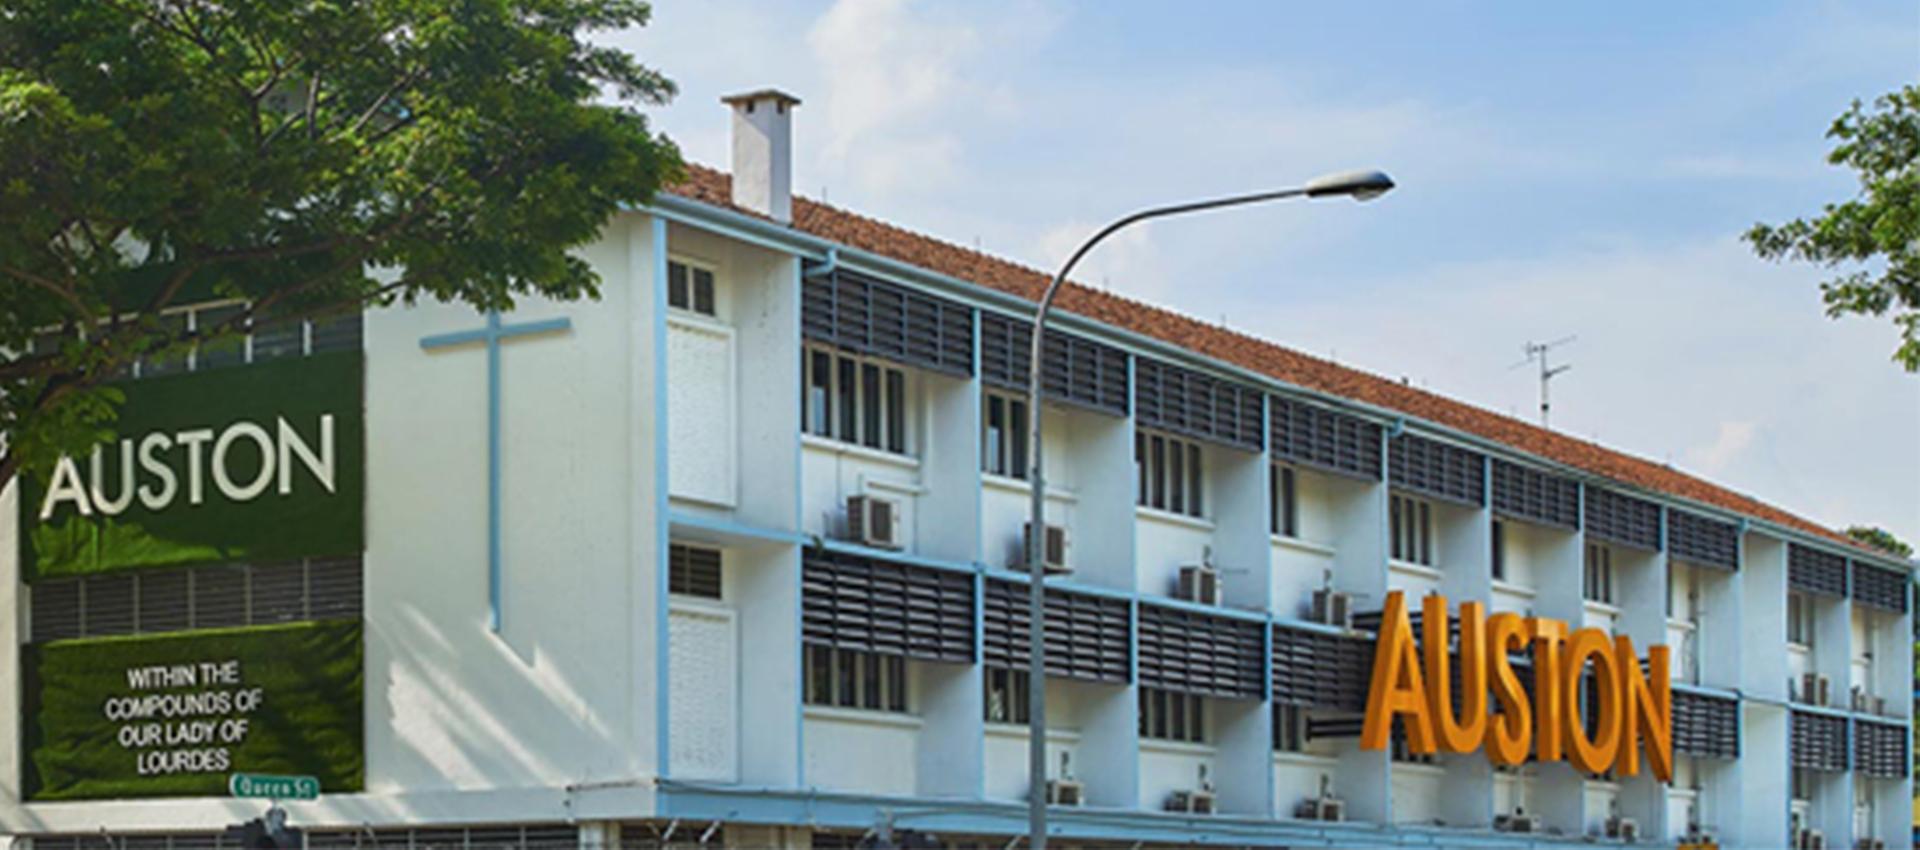 Yesman.lk - Cover Image - Auston Institute Ceylon